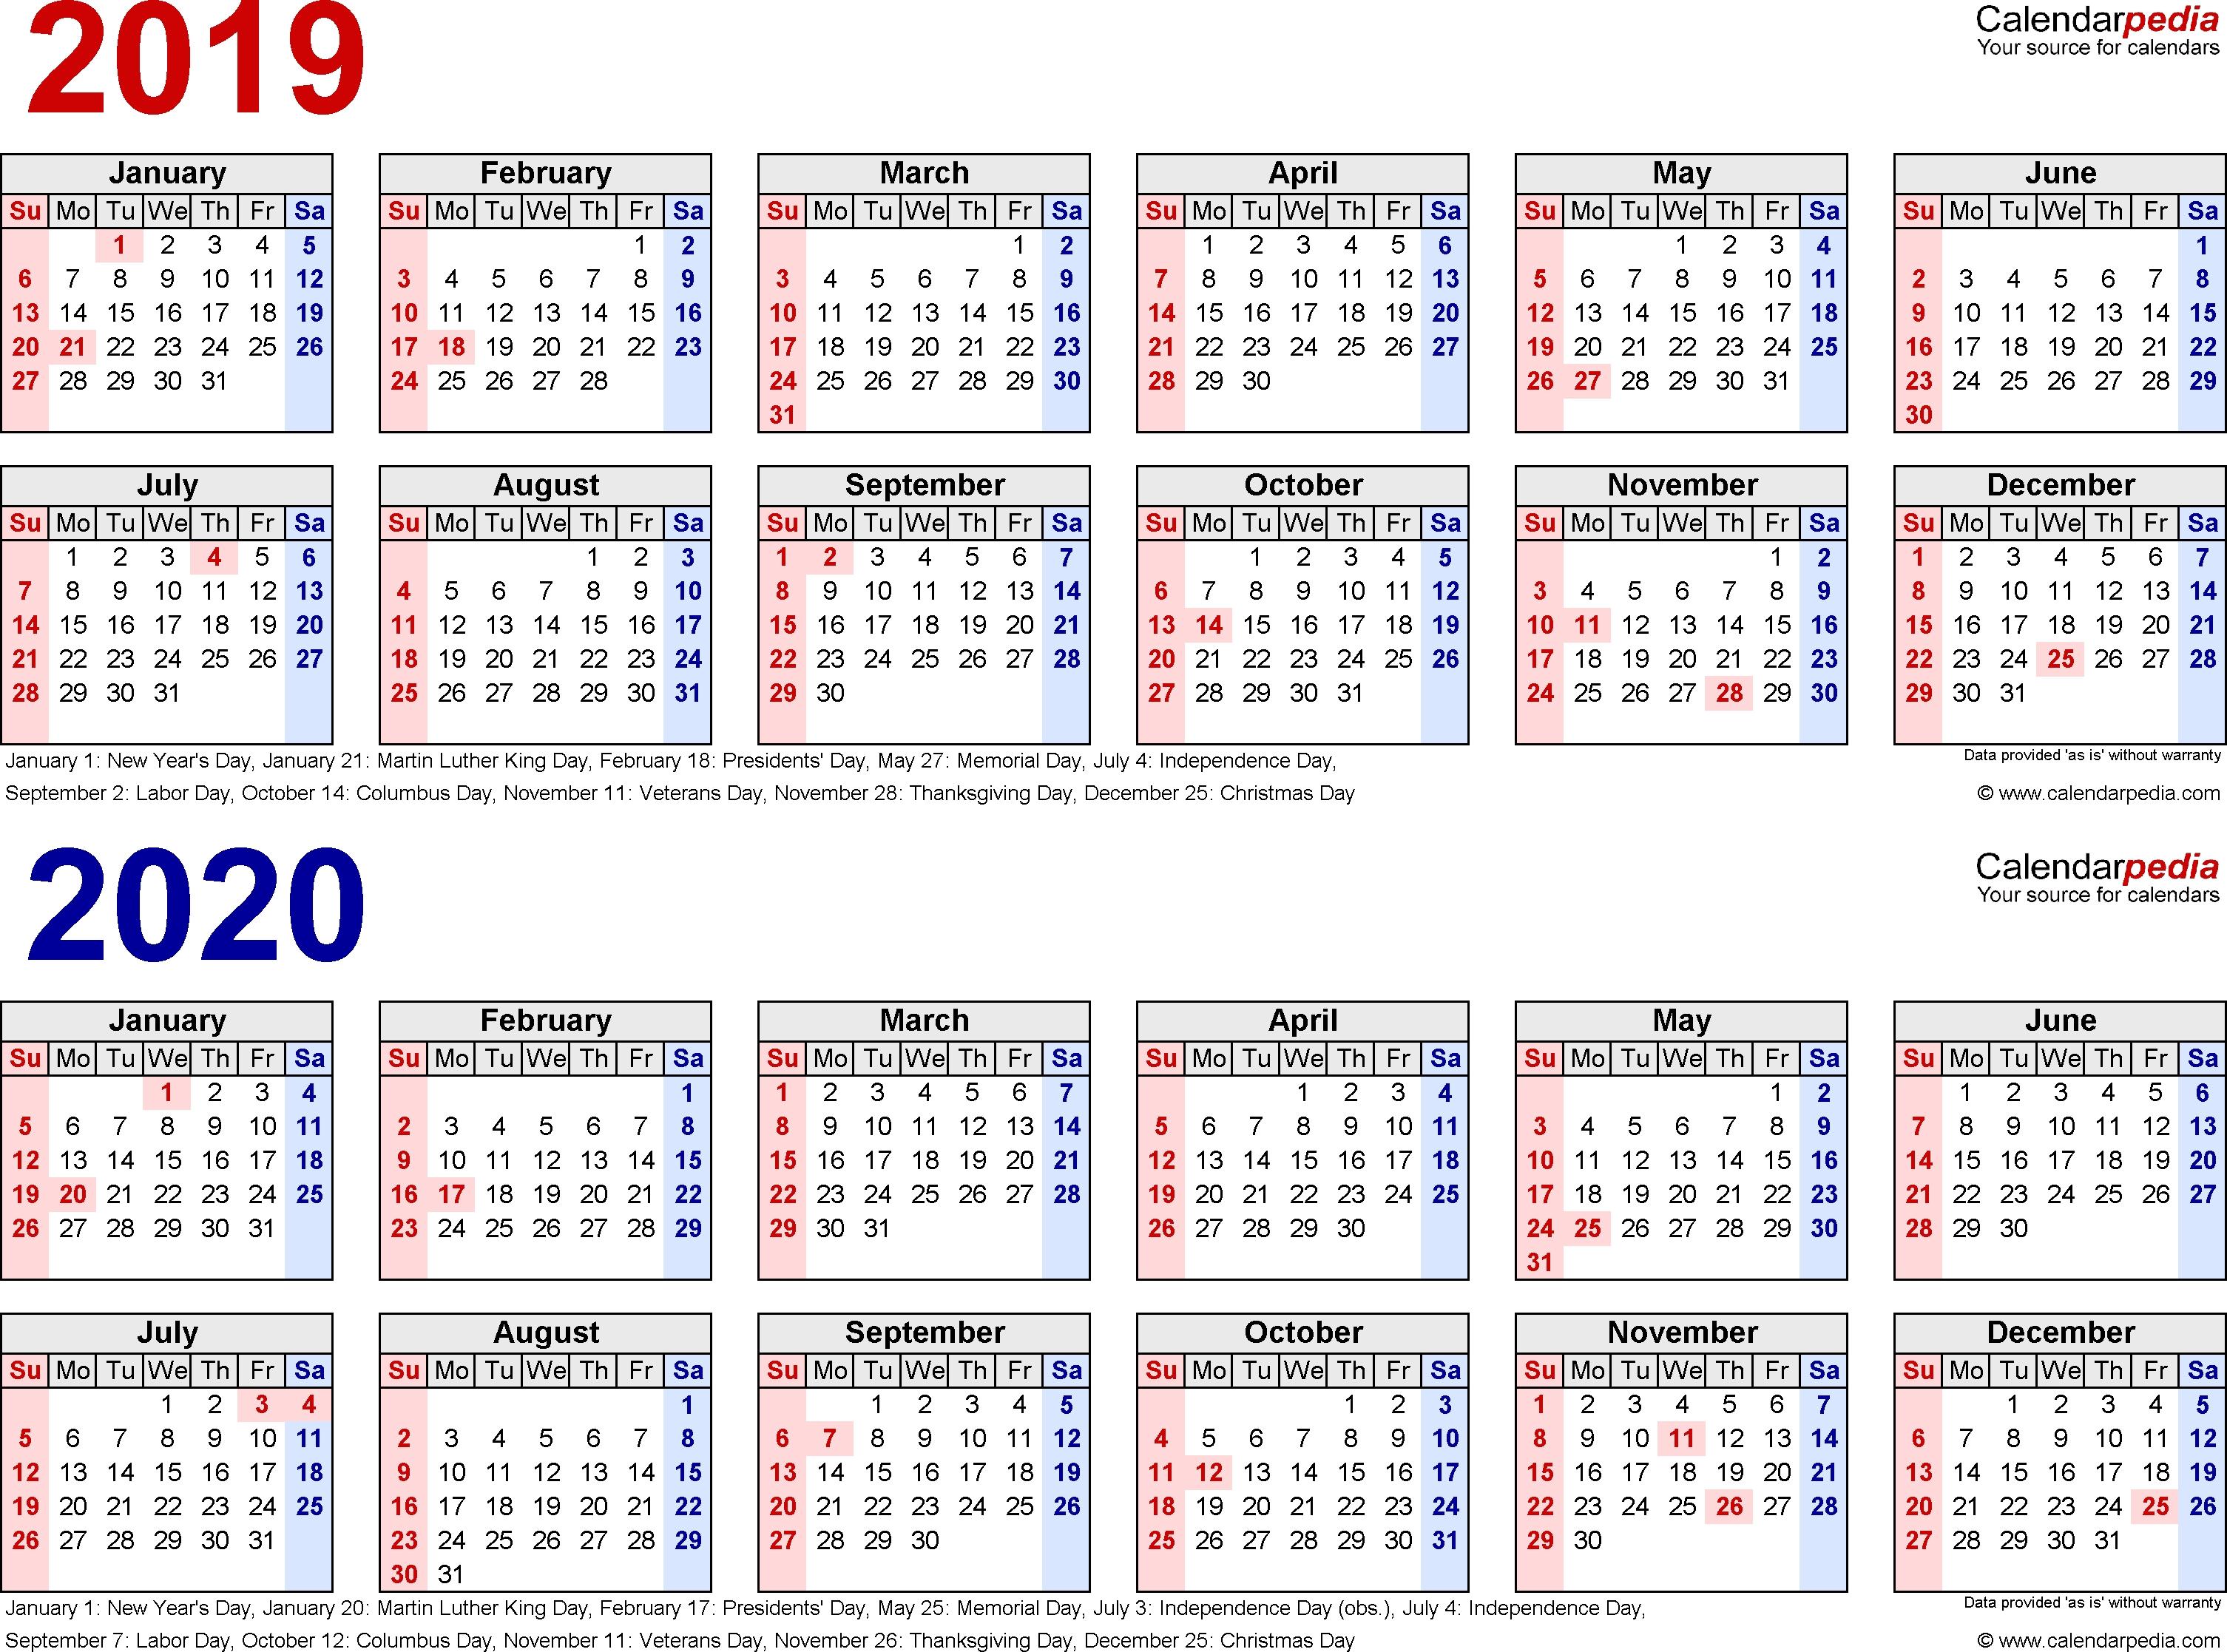 2019-2020 Calendar - Free Printable Two-Year Pdf Calendars regarding Google Calendar Printable 2019 2020